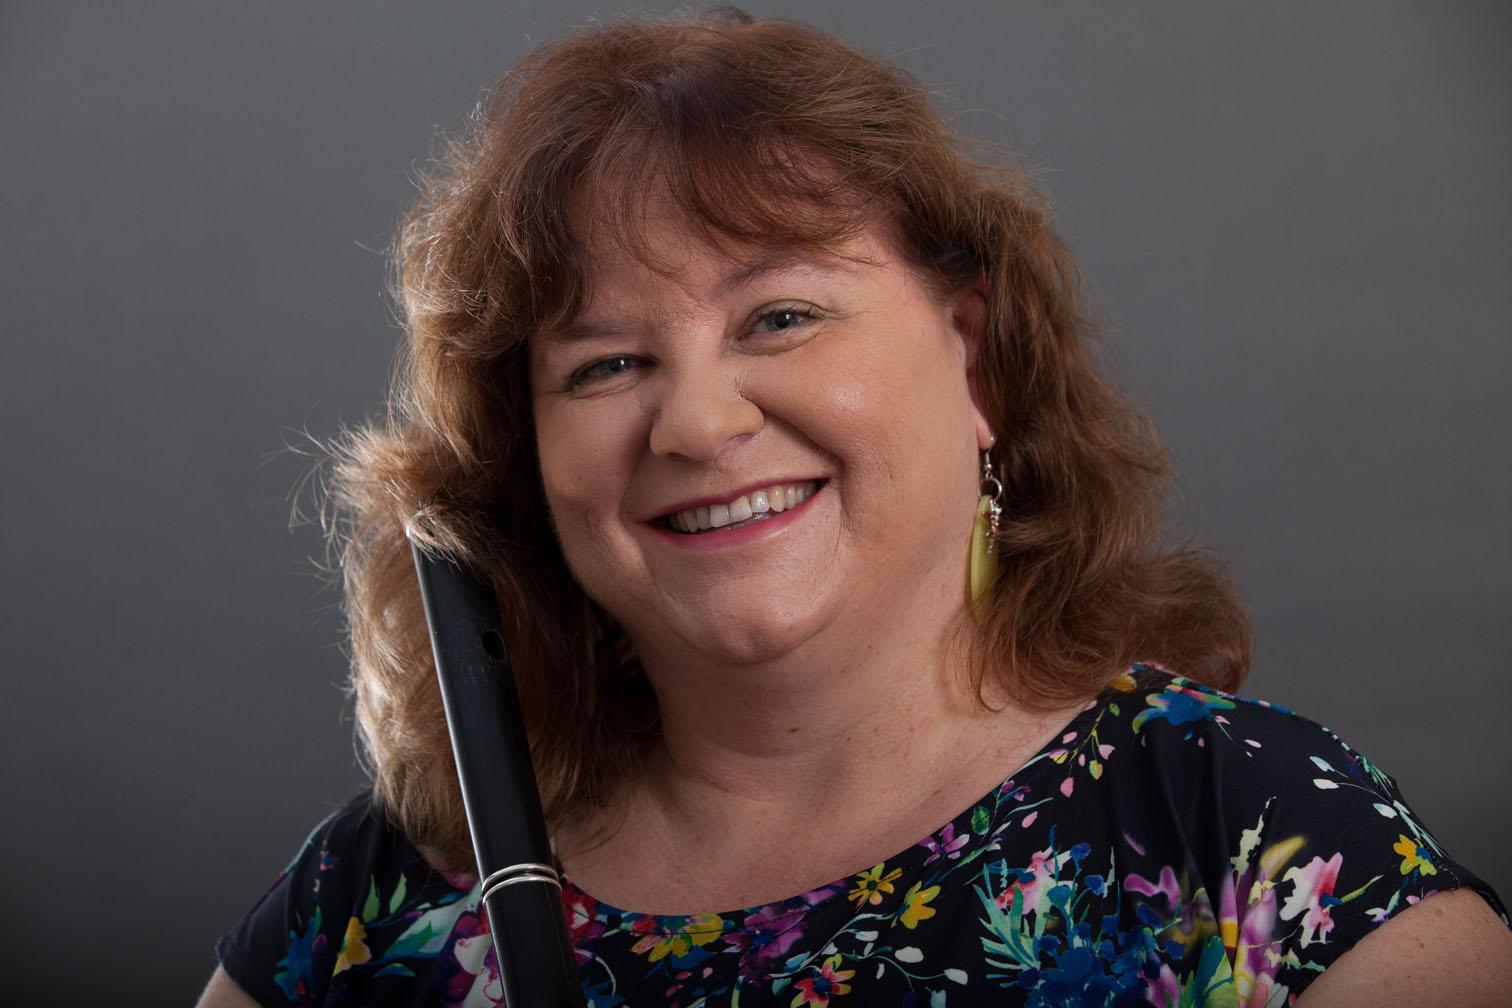 Irish flute player Neansaí Ní Choisdealbha